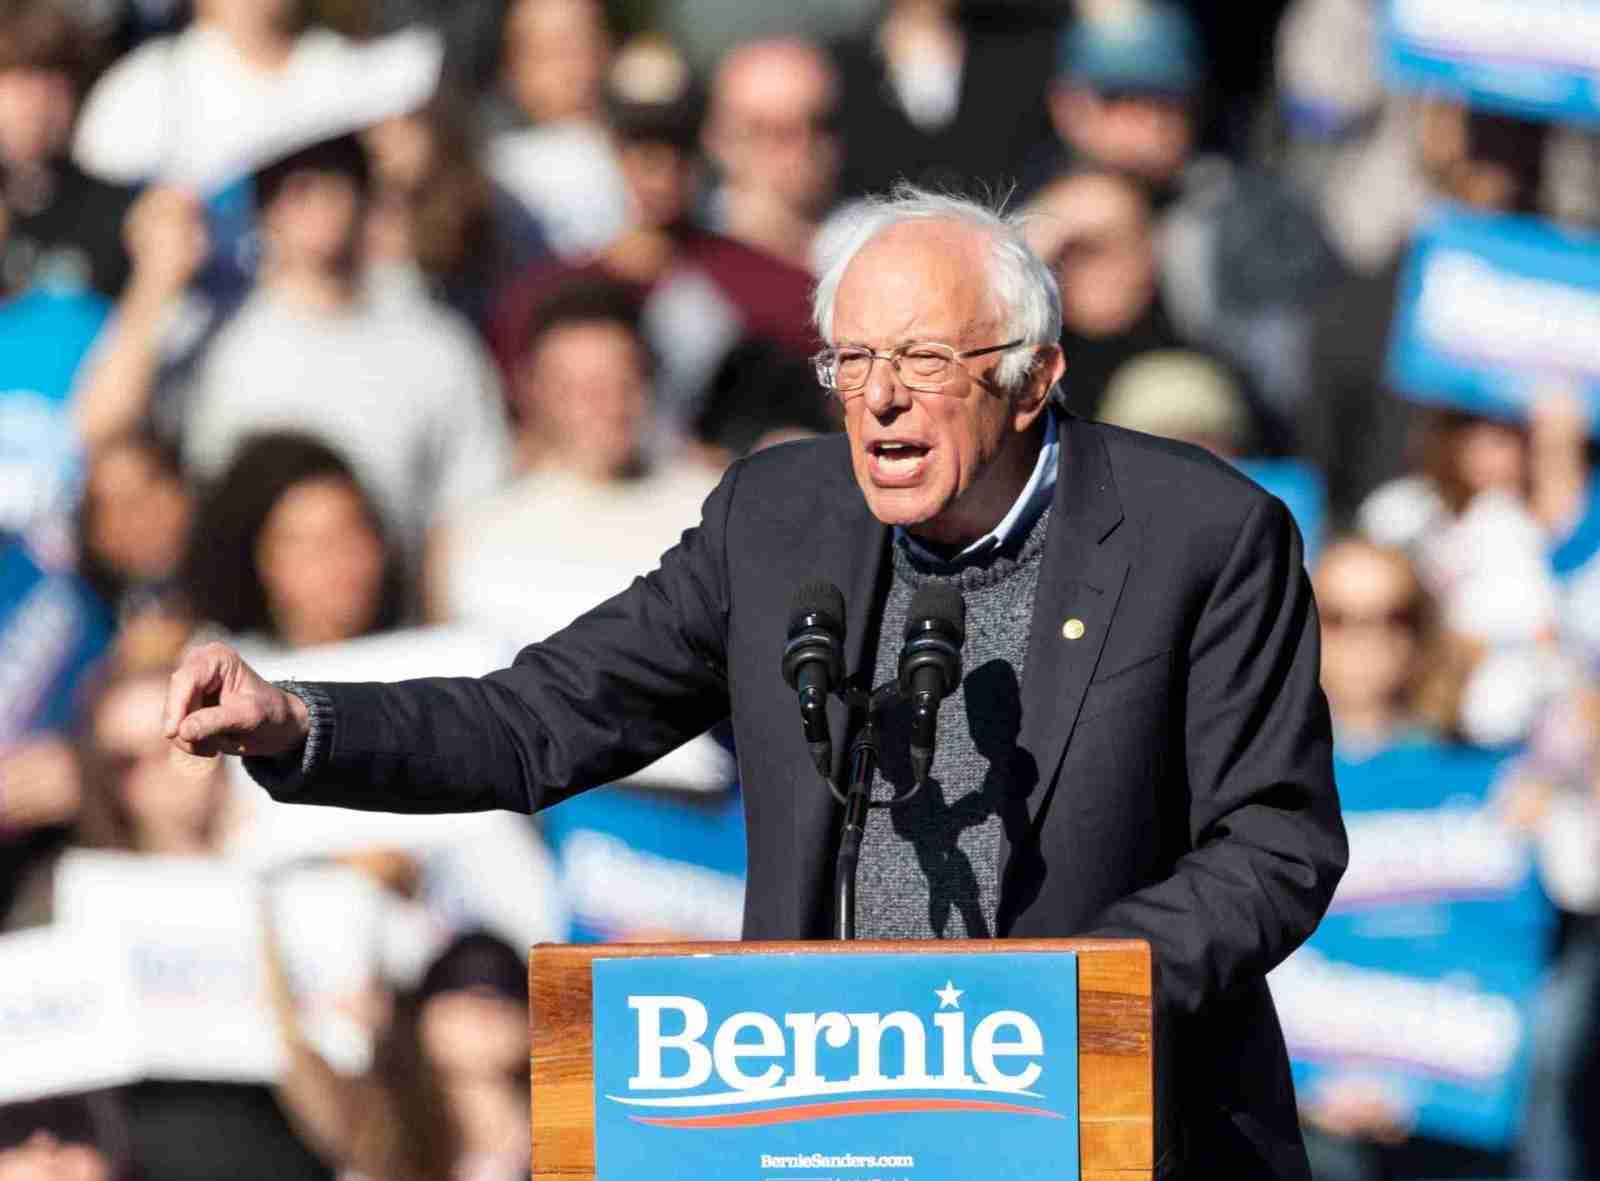 It's Official Bernie Sanders Wins New Hampshire 7